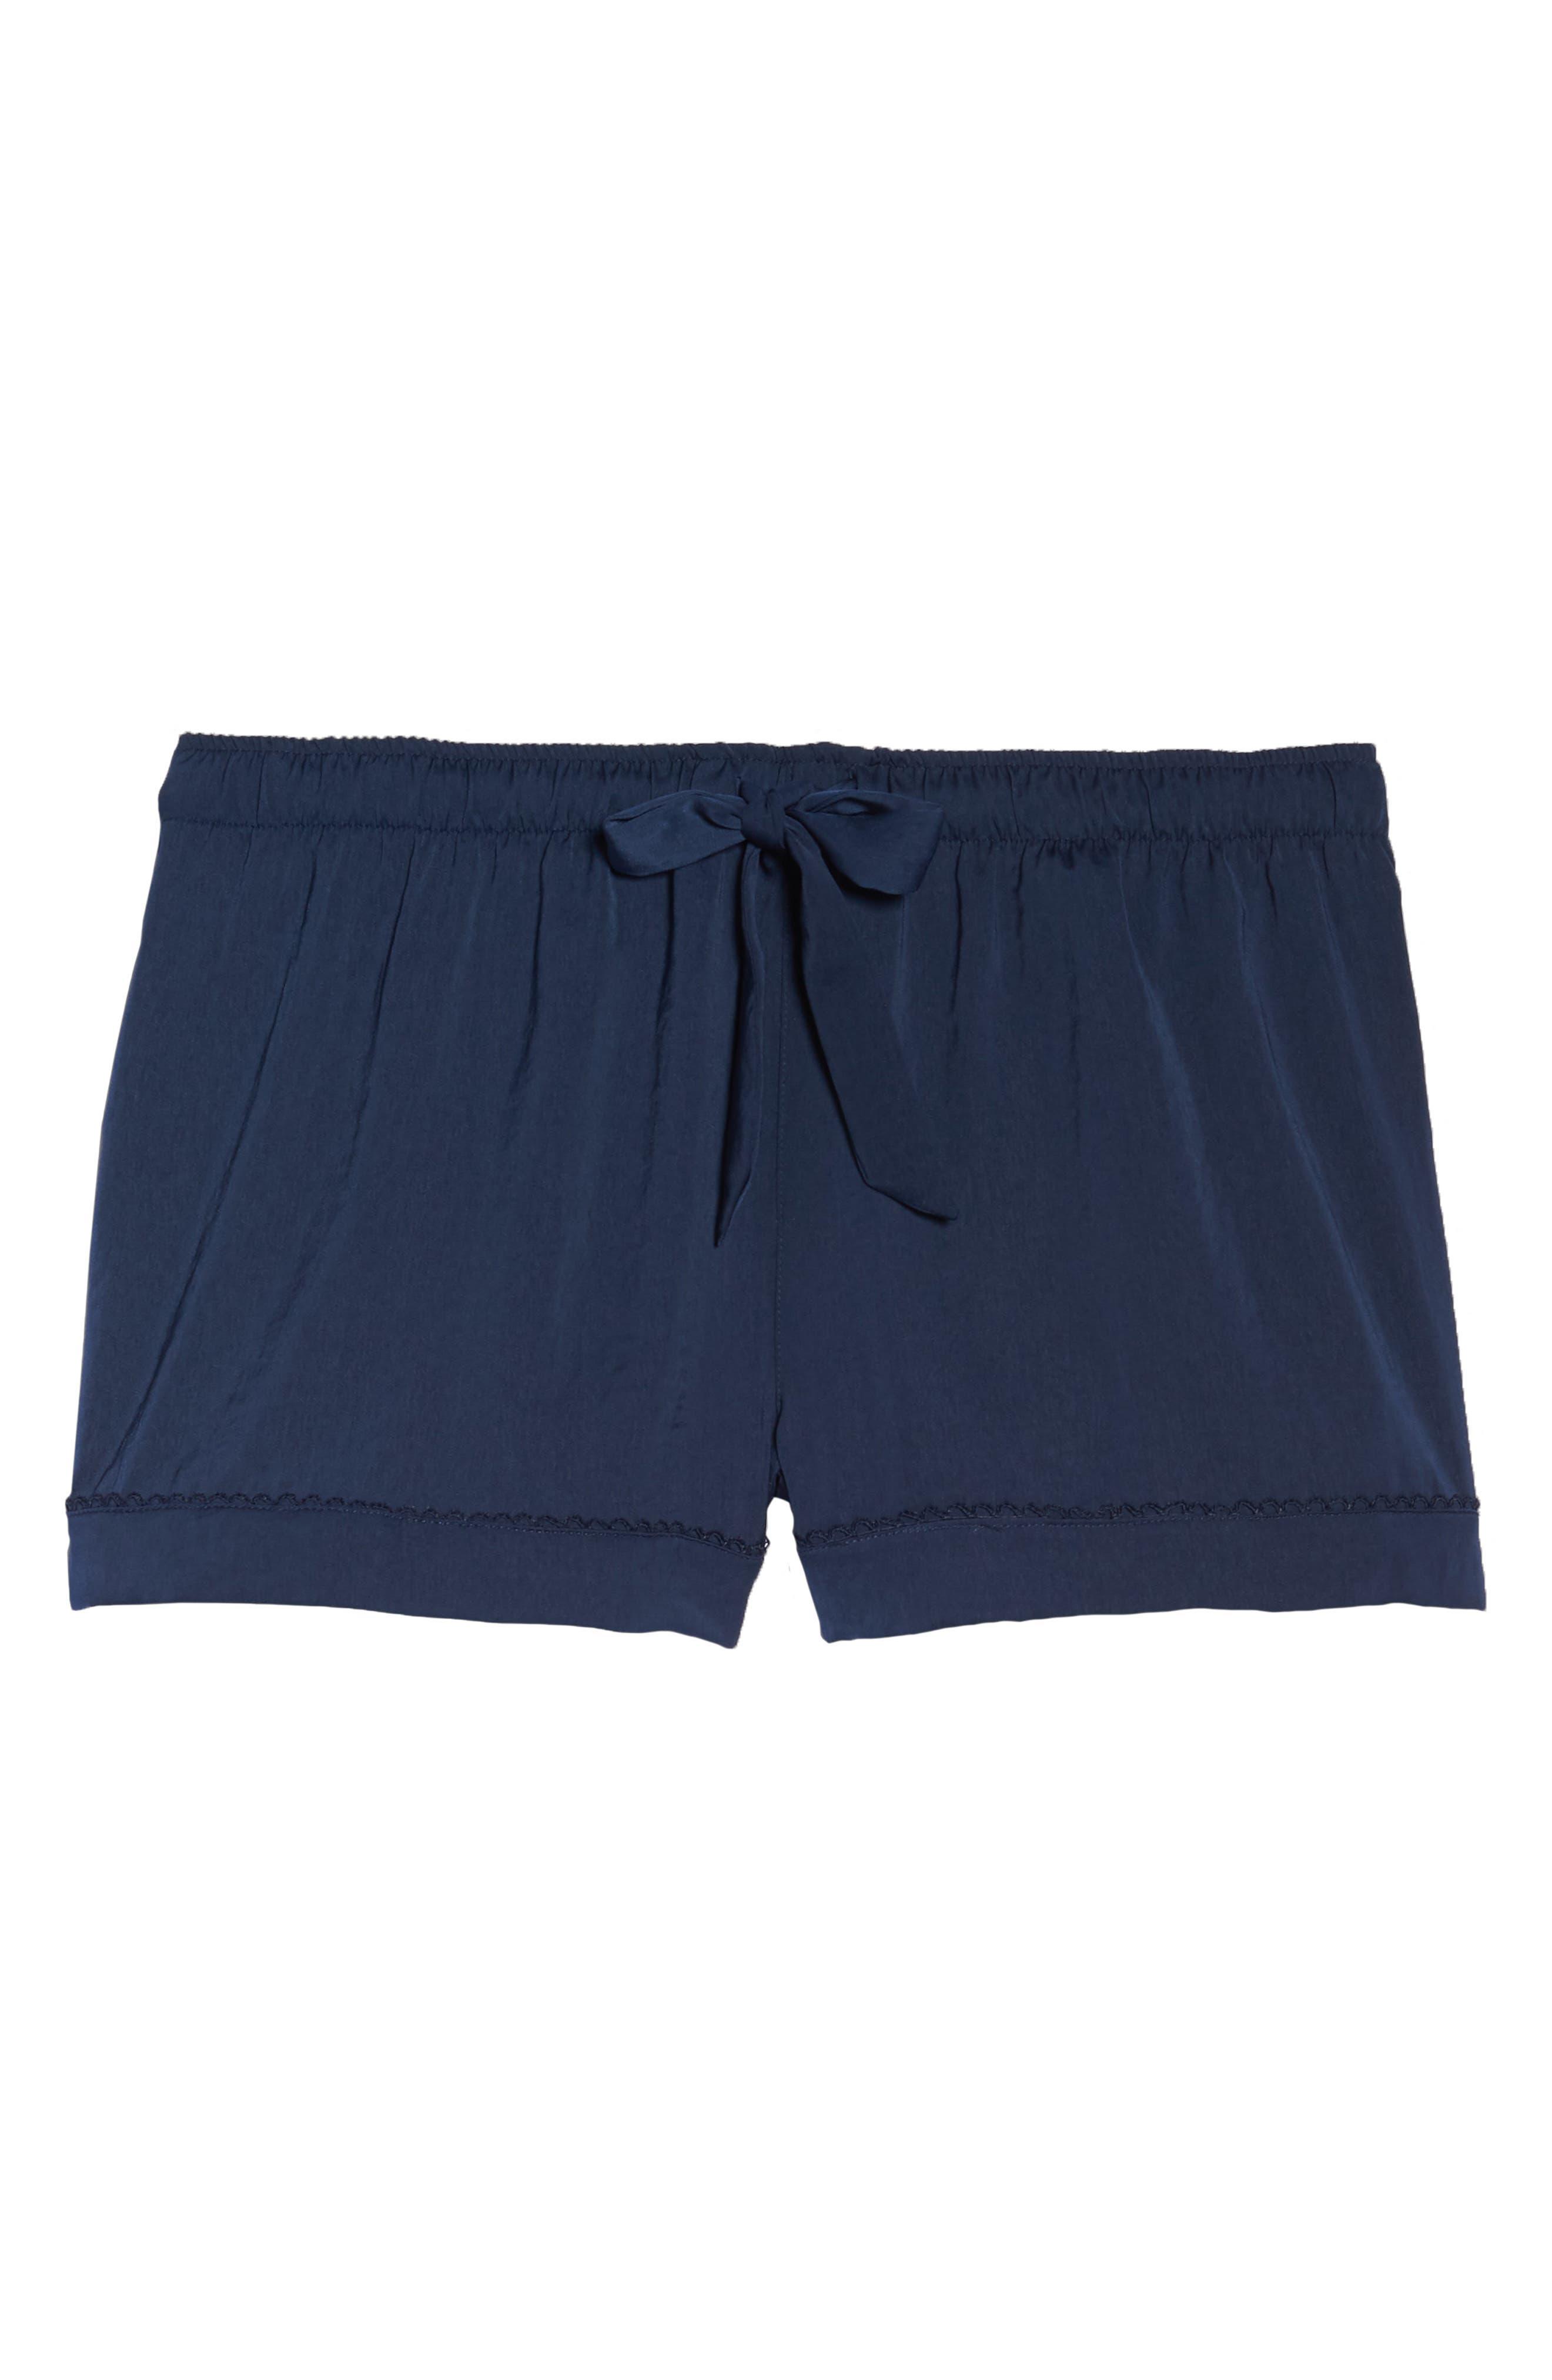 Pajama Shorts,                             Alternate thumbnail 6, color,                             400